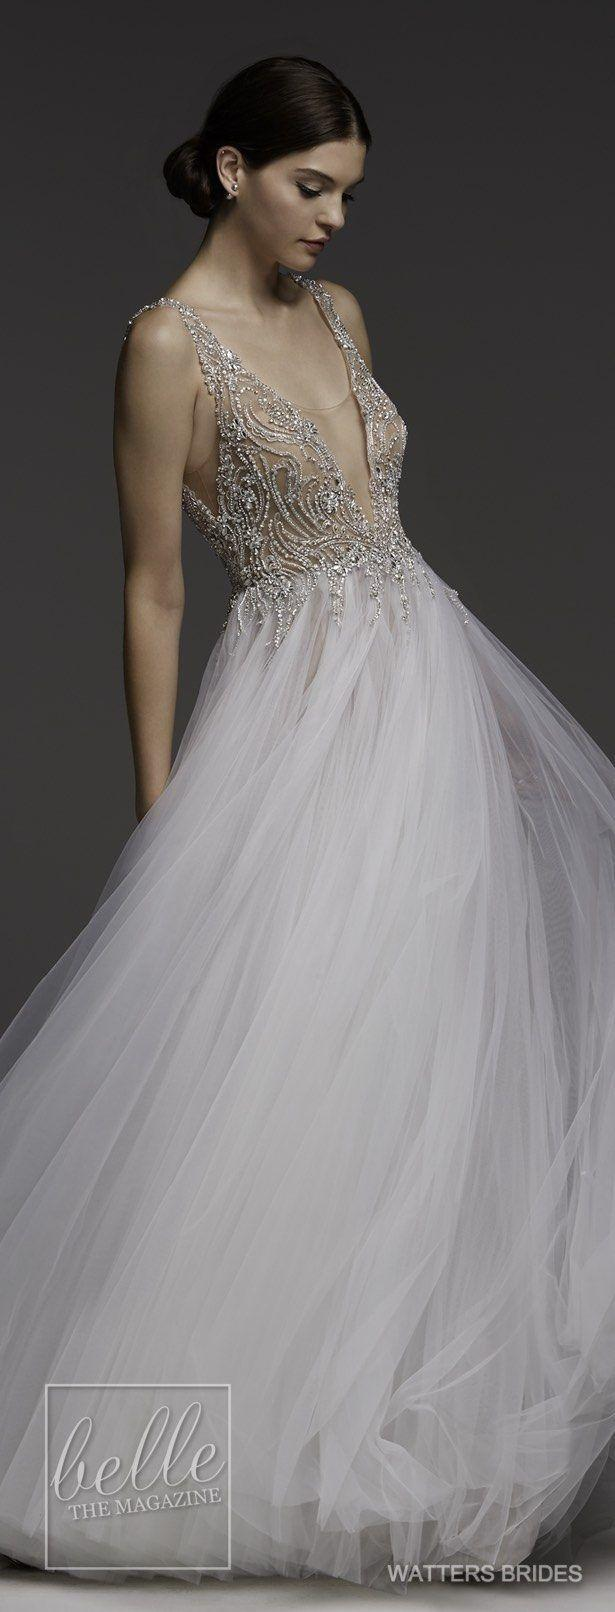 Wedding - Wedding Dresses By Watters Brides Spring 2018